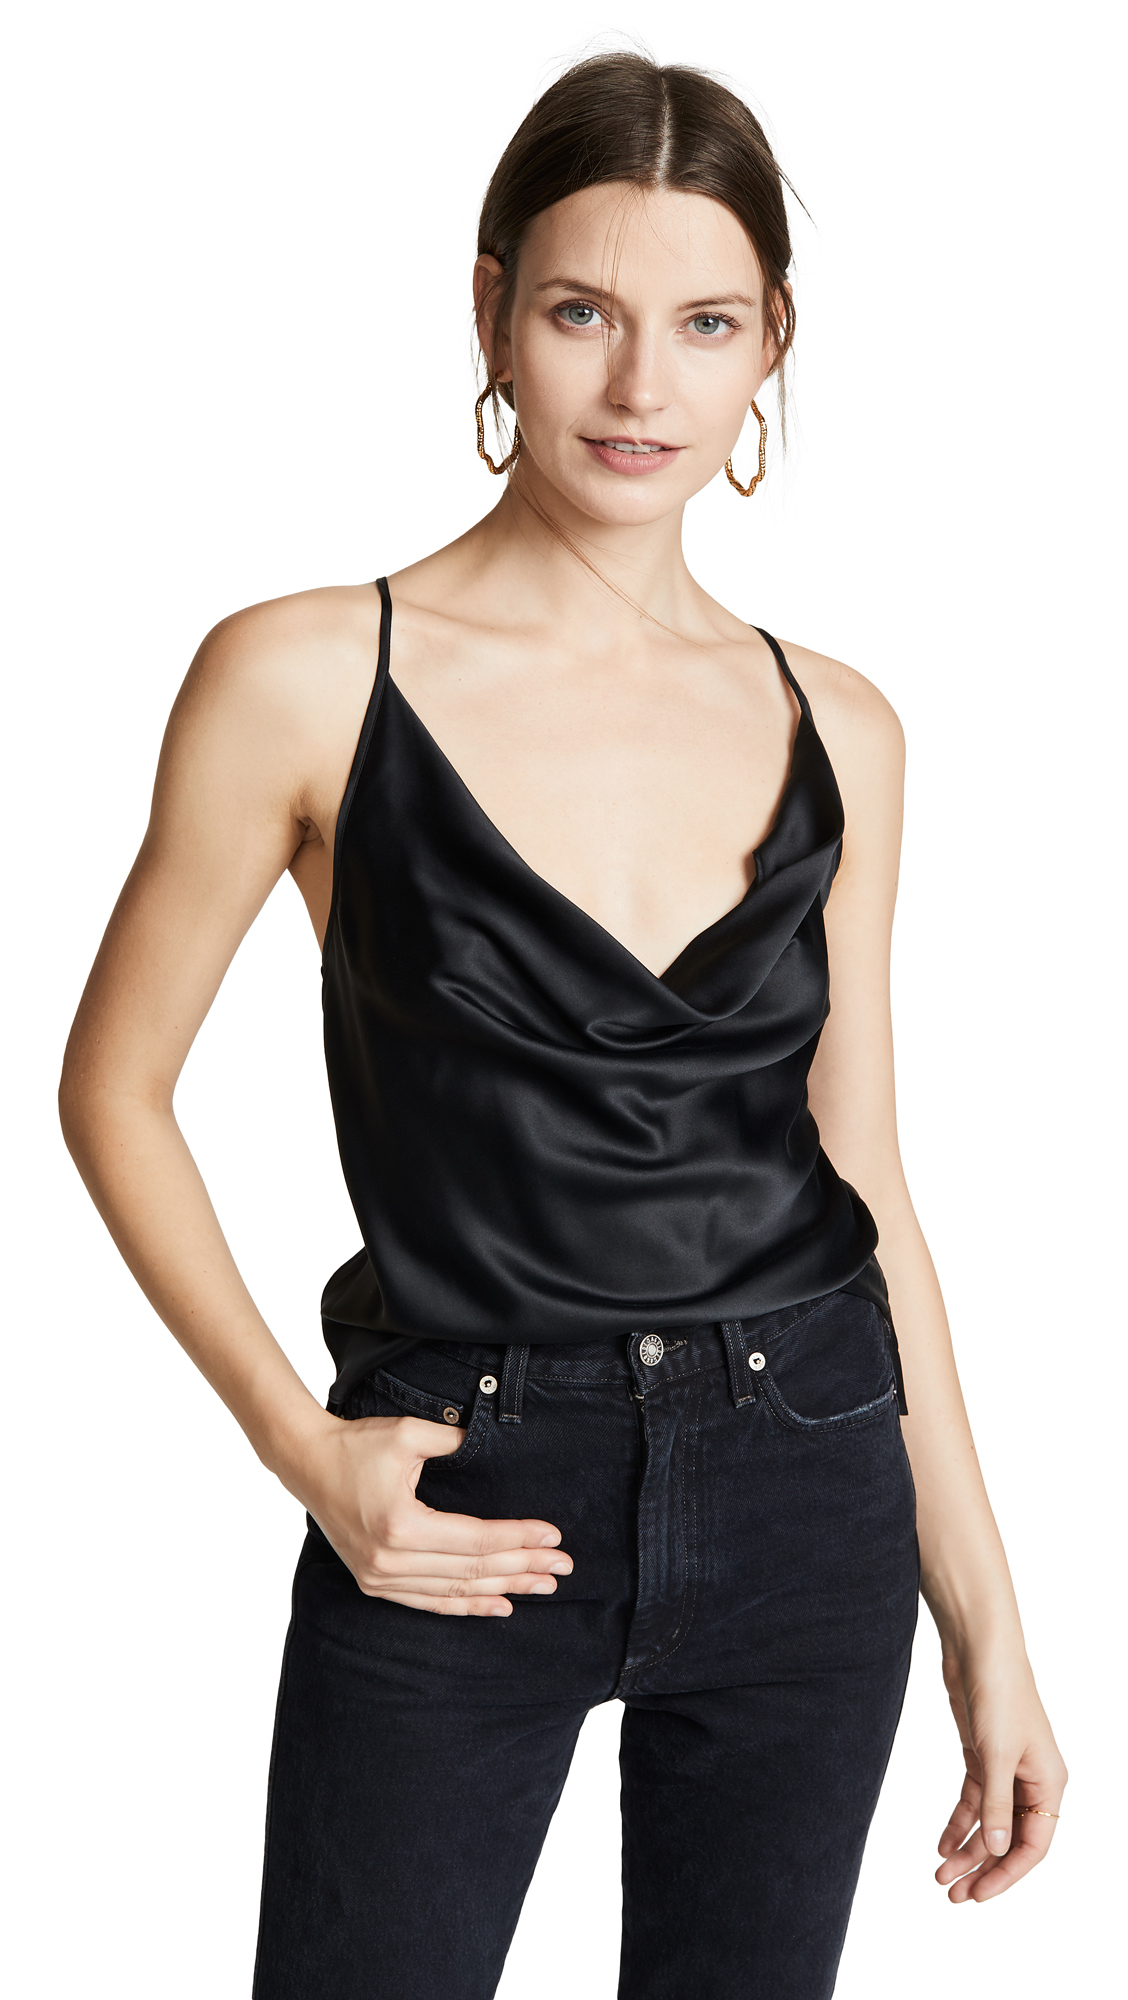 CAMI NYC Jacqueline Top - 30% Off Sale